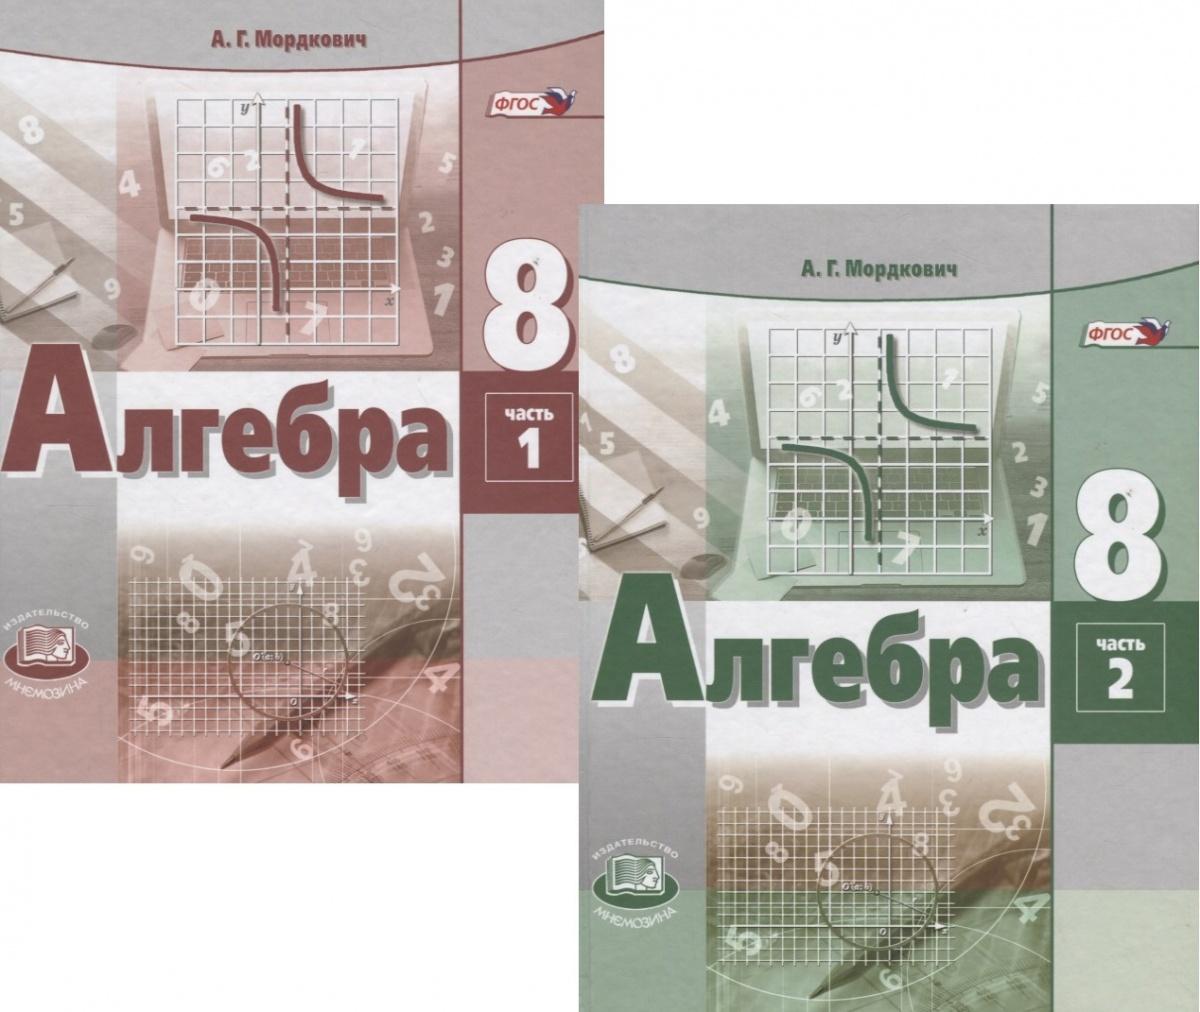 Мордкович А. Алгебра. 8 класс. Учебник. В двух частях (Комплект из 2 книг) алгебра 8 класс учебник фгос